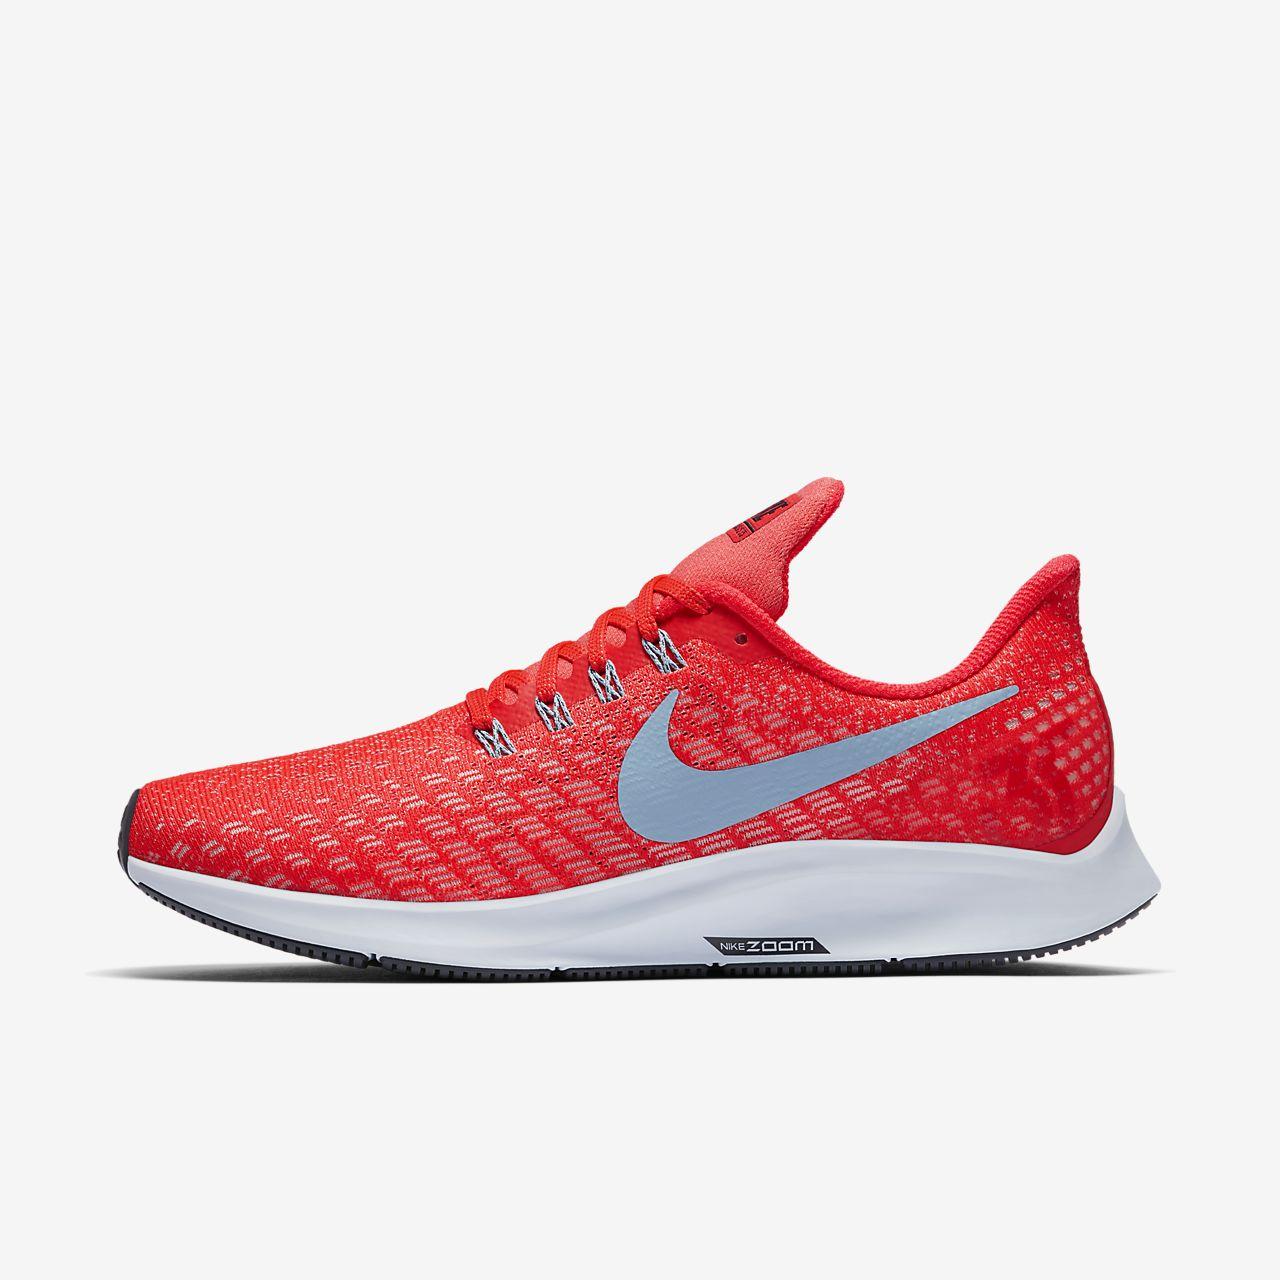 b474d1a3939cc Nike Air Zoom Pegasus 35 Women s Running Shoe. Nike.com CH